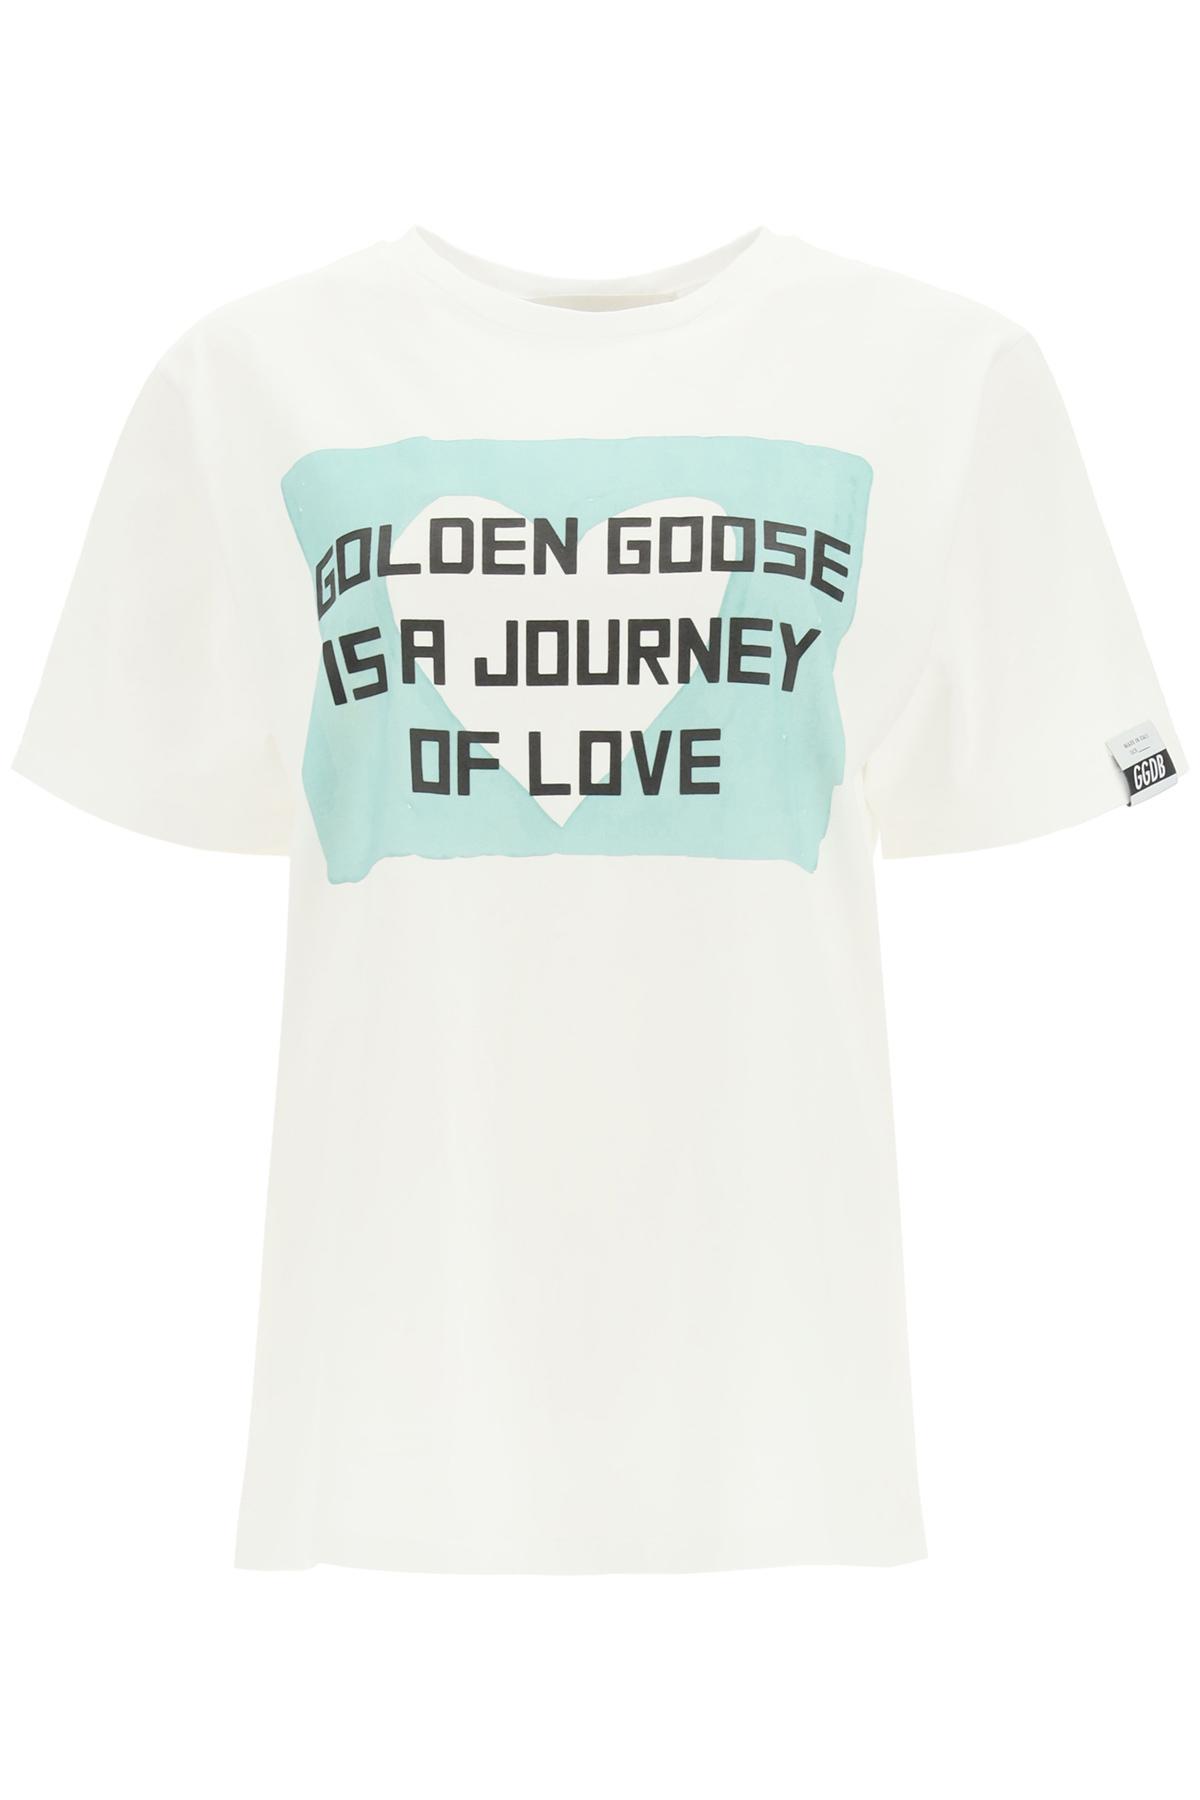 Golden goose t-shirt aira journey of love boyfriend